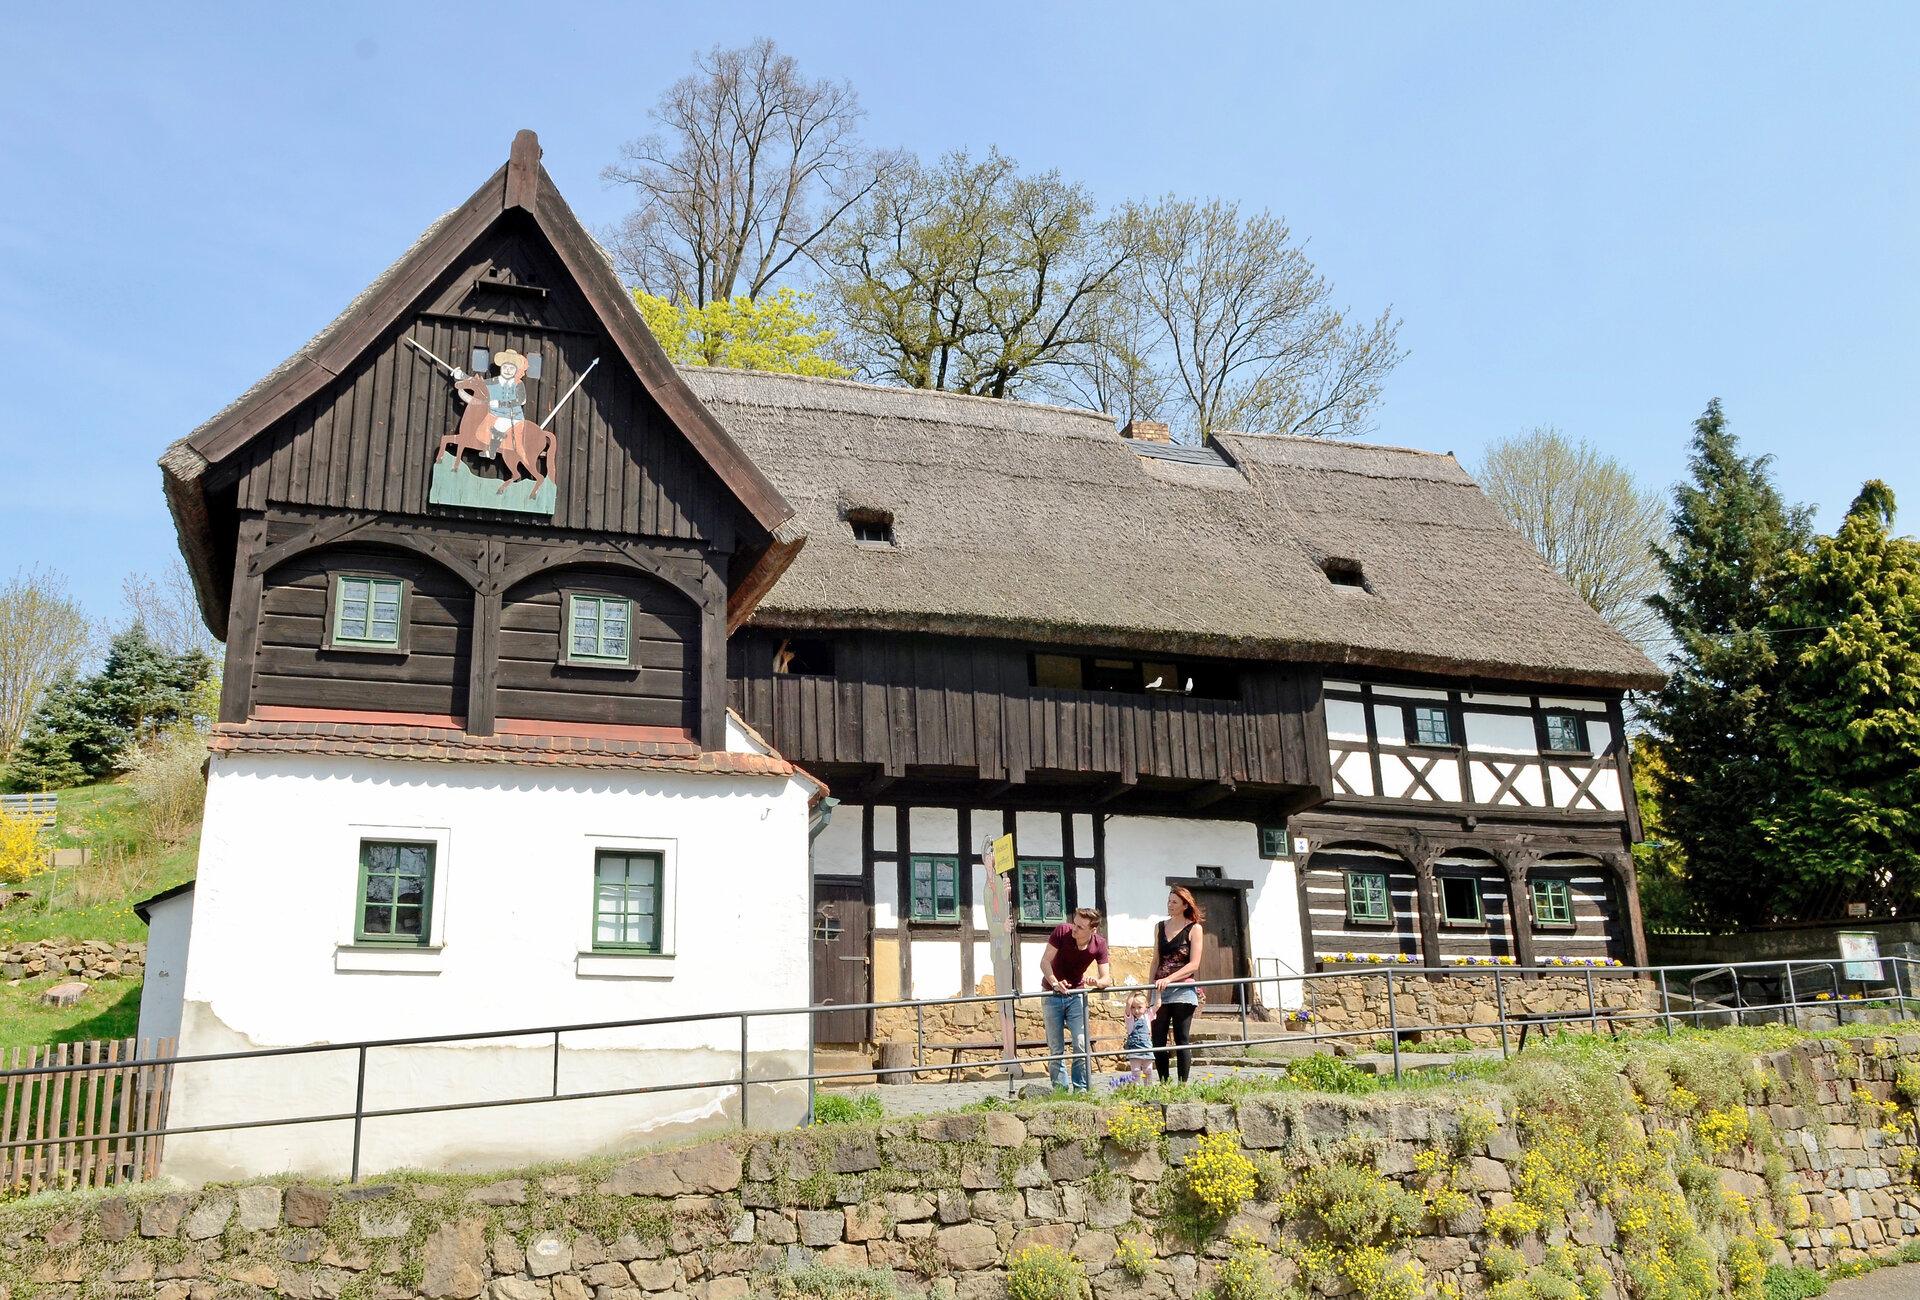 Reiterhaus